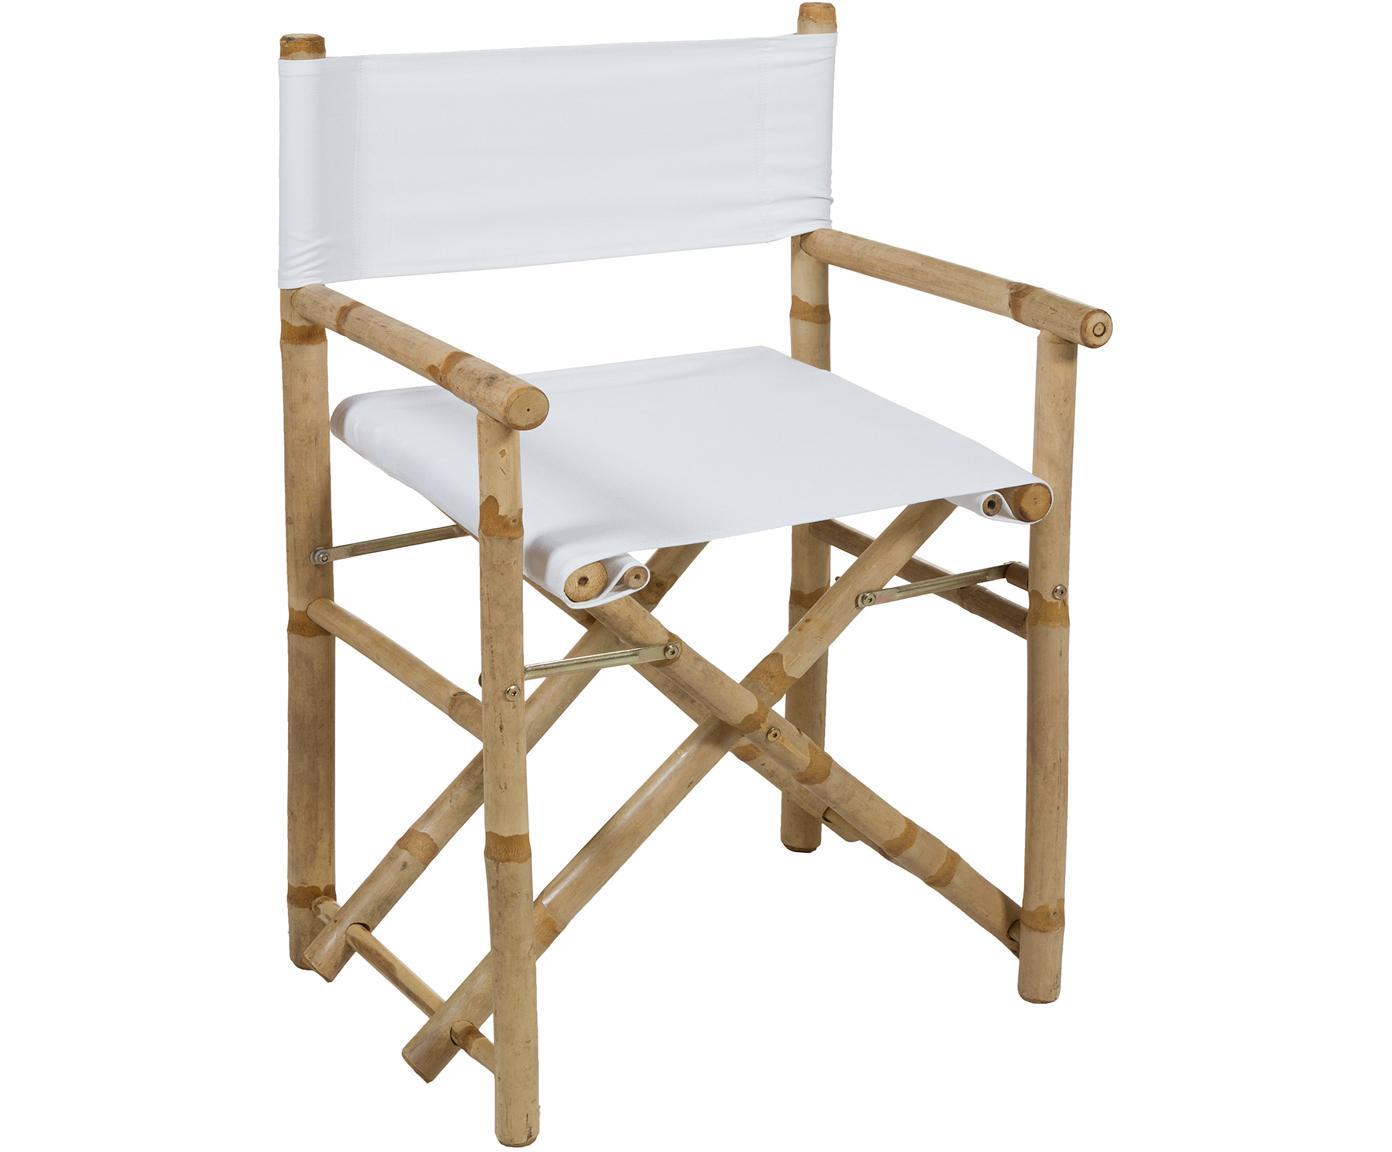 Klappbarer Bambus-Regiestuhl Limboo, Gestell: Bambus, Sitzfläche: Polyester, Bambus, Weiß, B 58 x T 45 cm